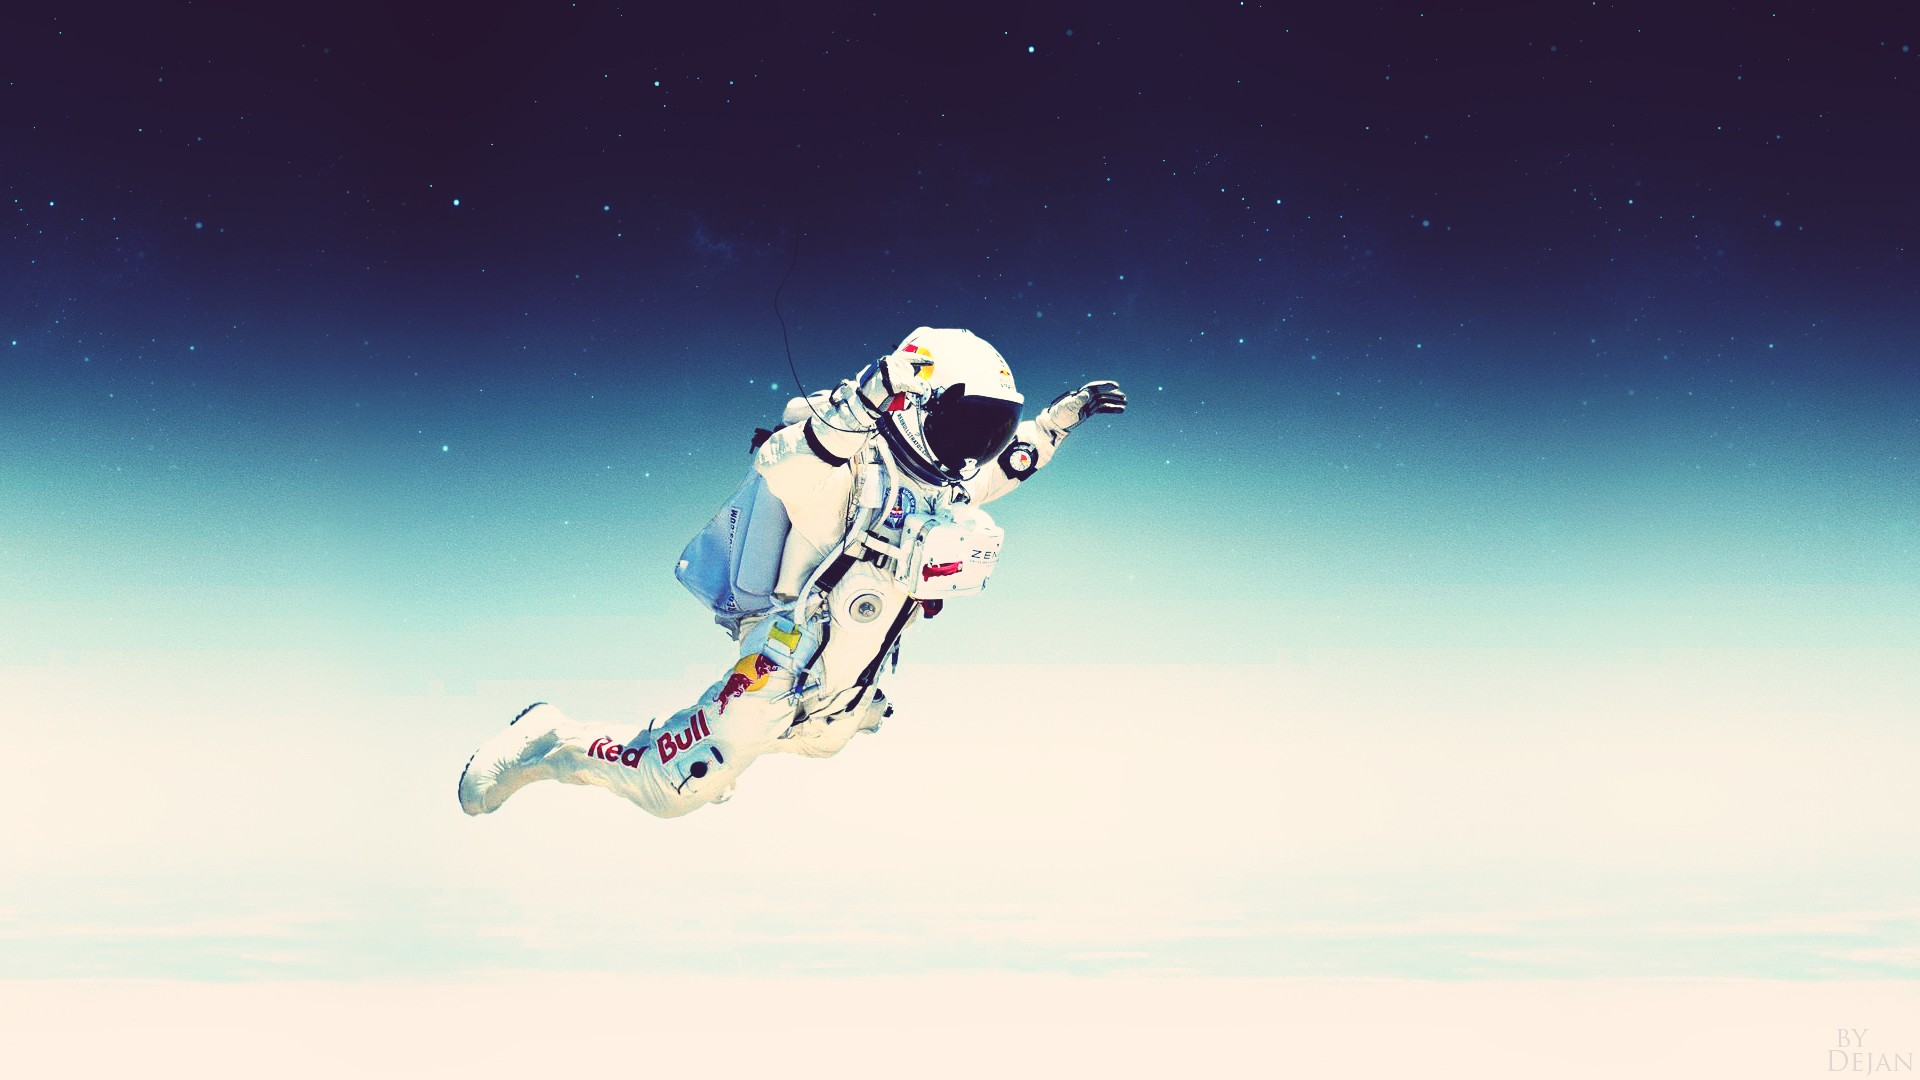 Skydive Free Fall Sports Wallpaper